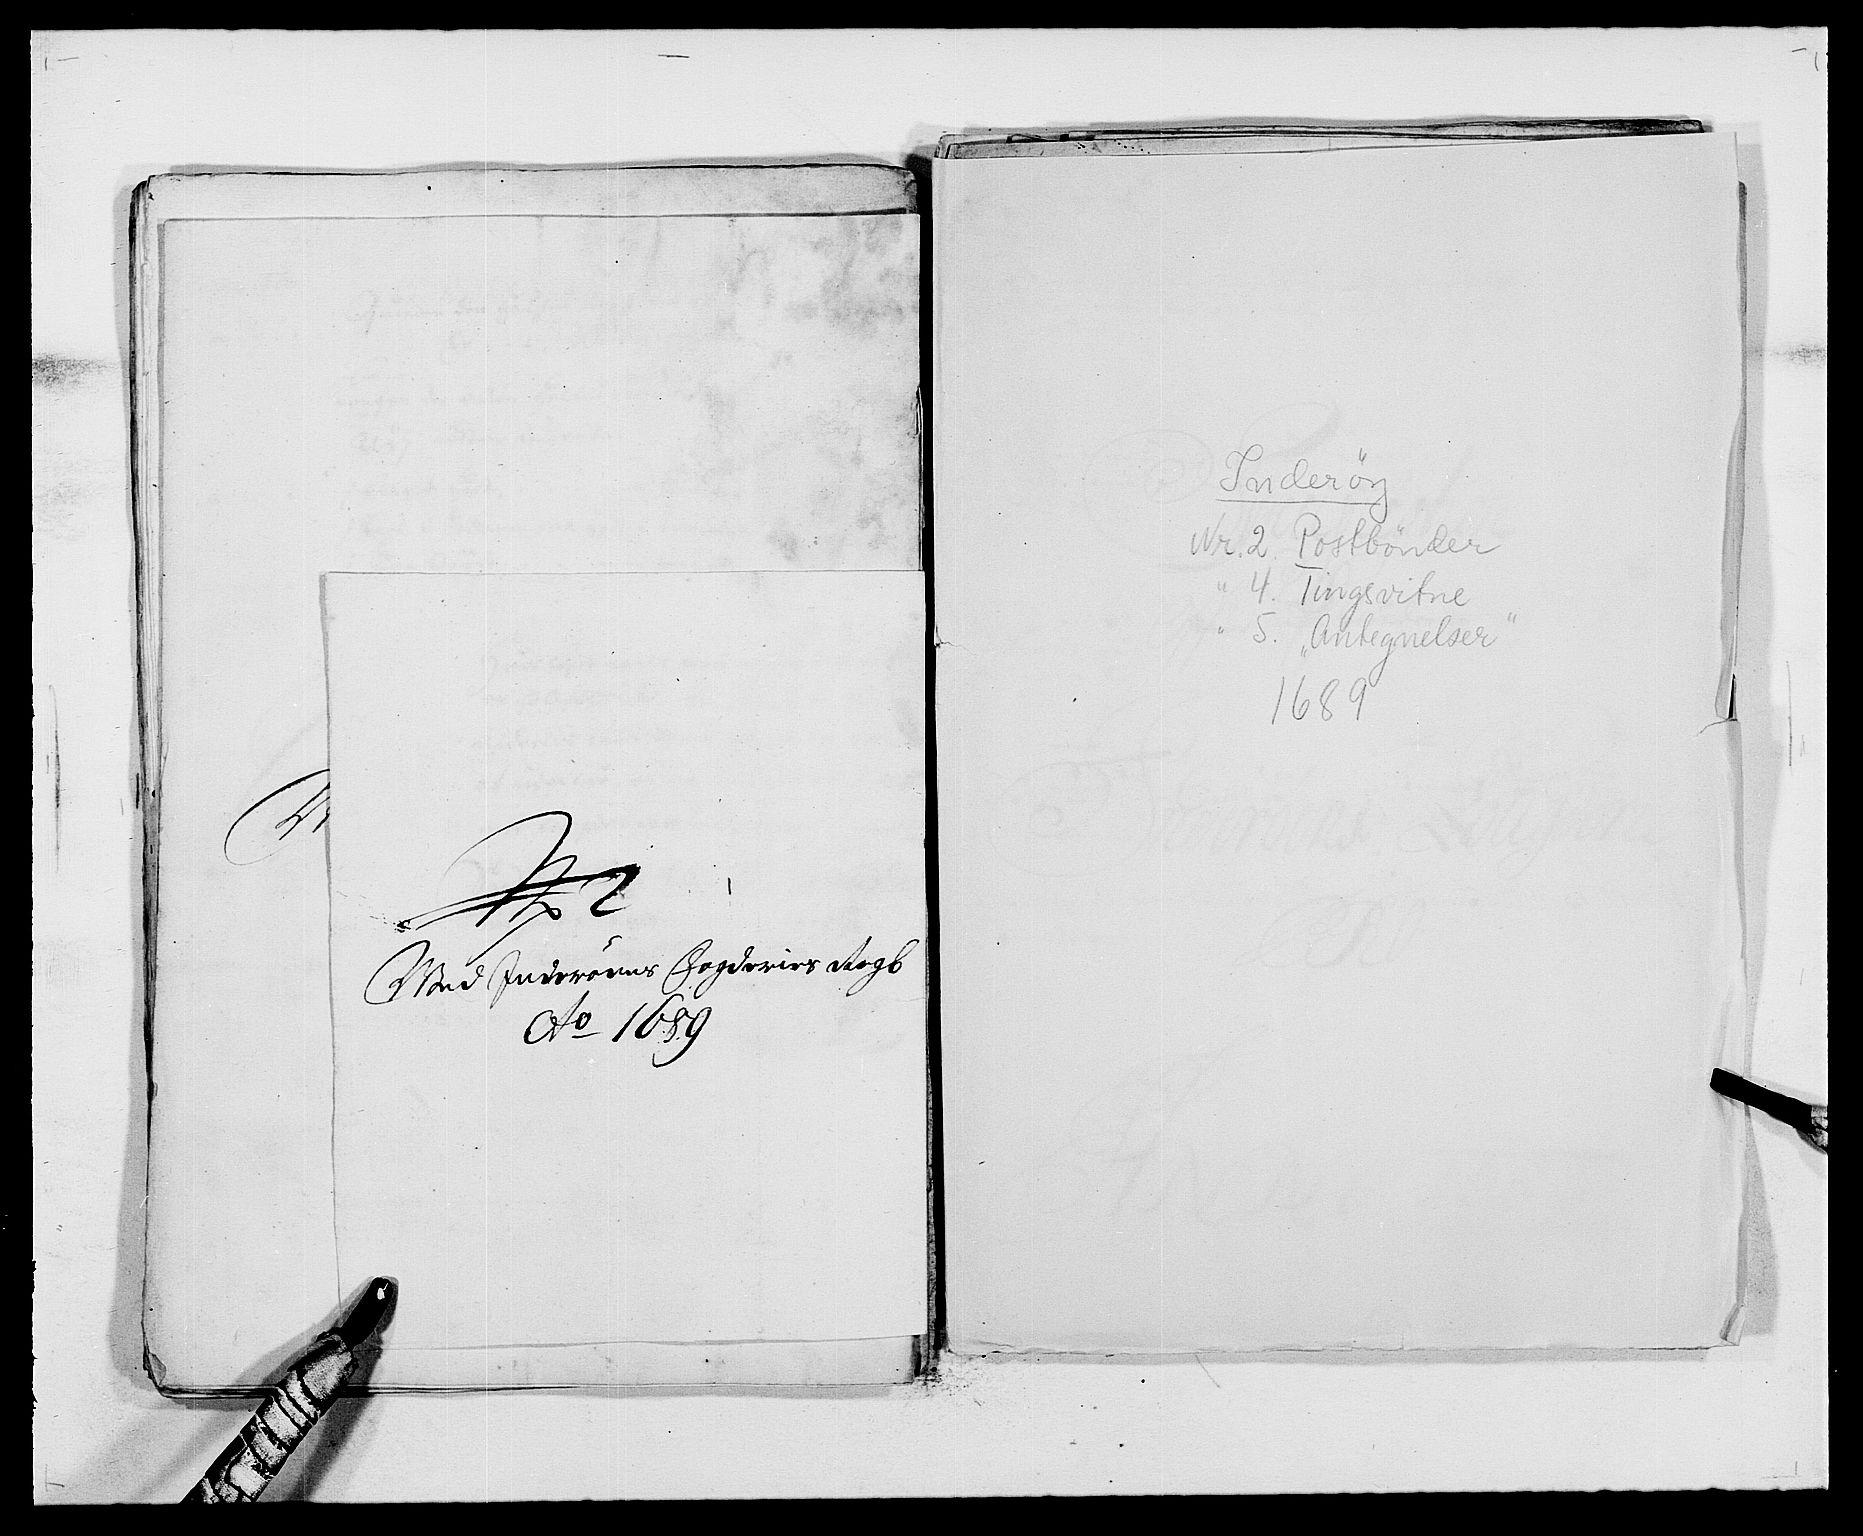 RA, Rentekammeret inntil 1814, Reviderte regnskaper, Fogderegnskap, R63/L4306: Fogderegnskap Inderøy, 1687-1689, s. 509